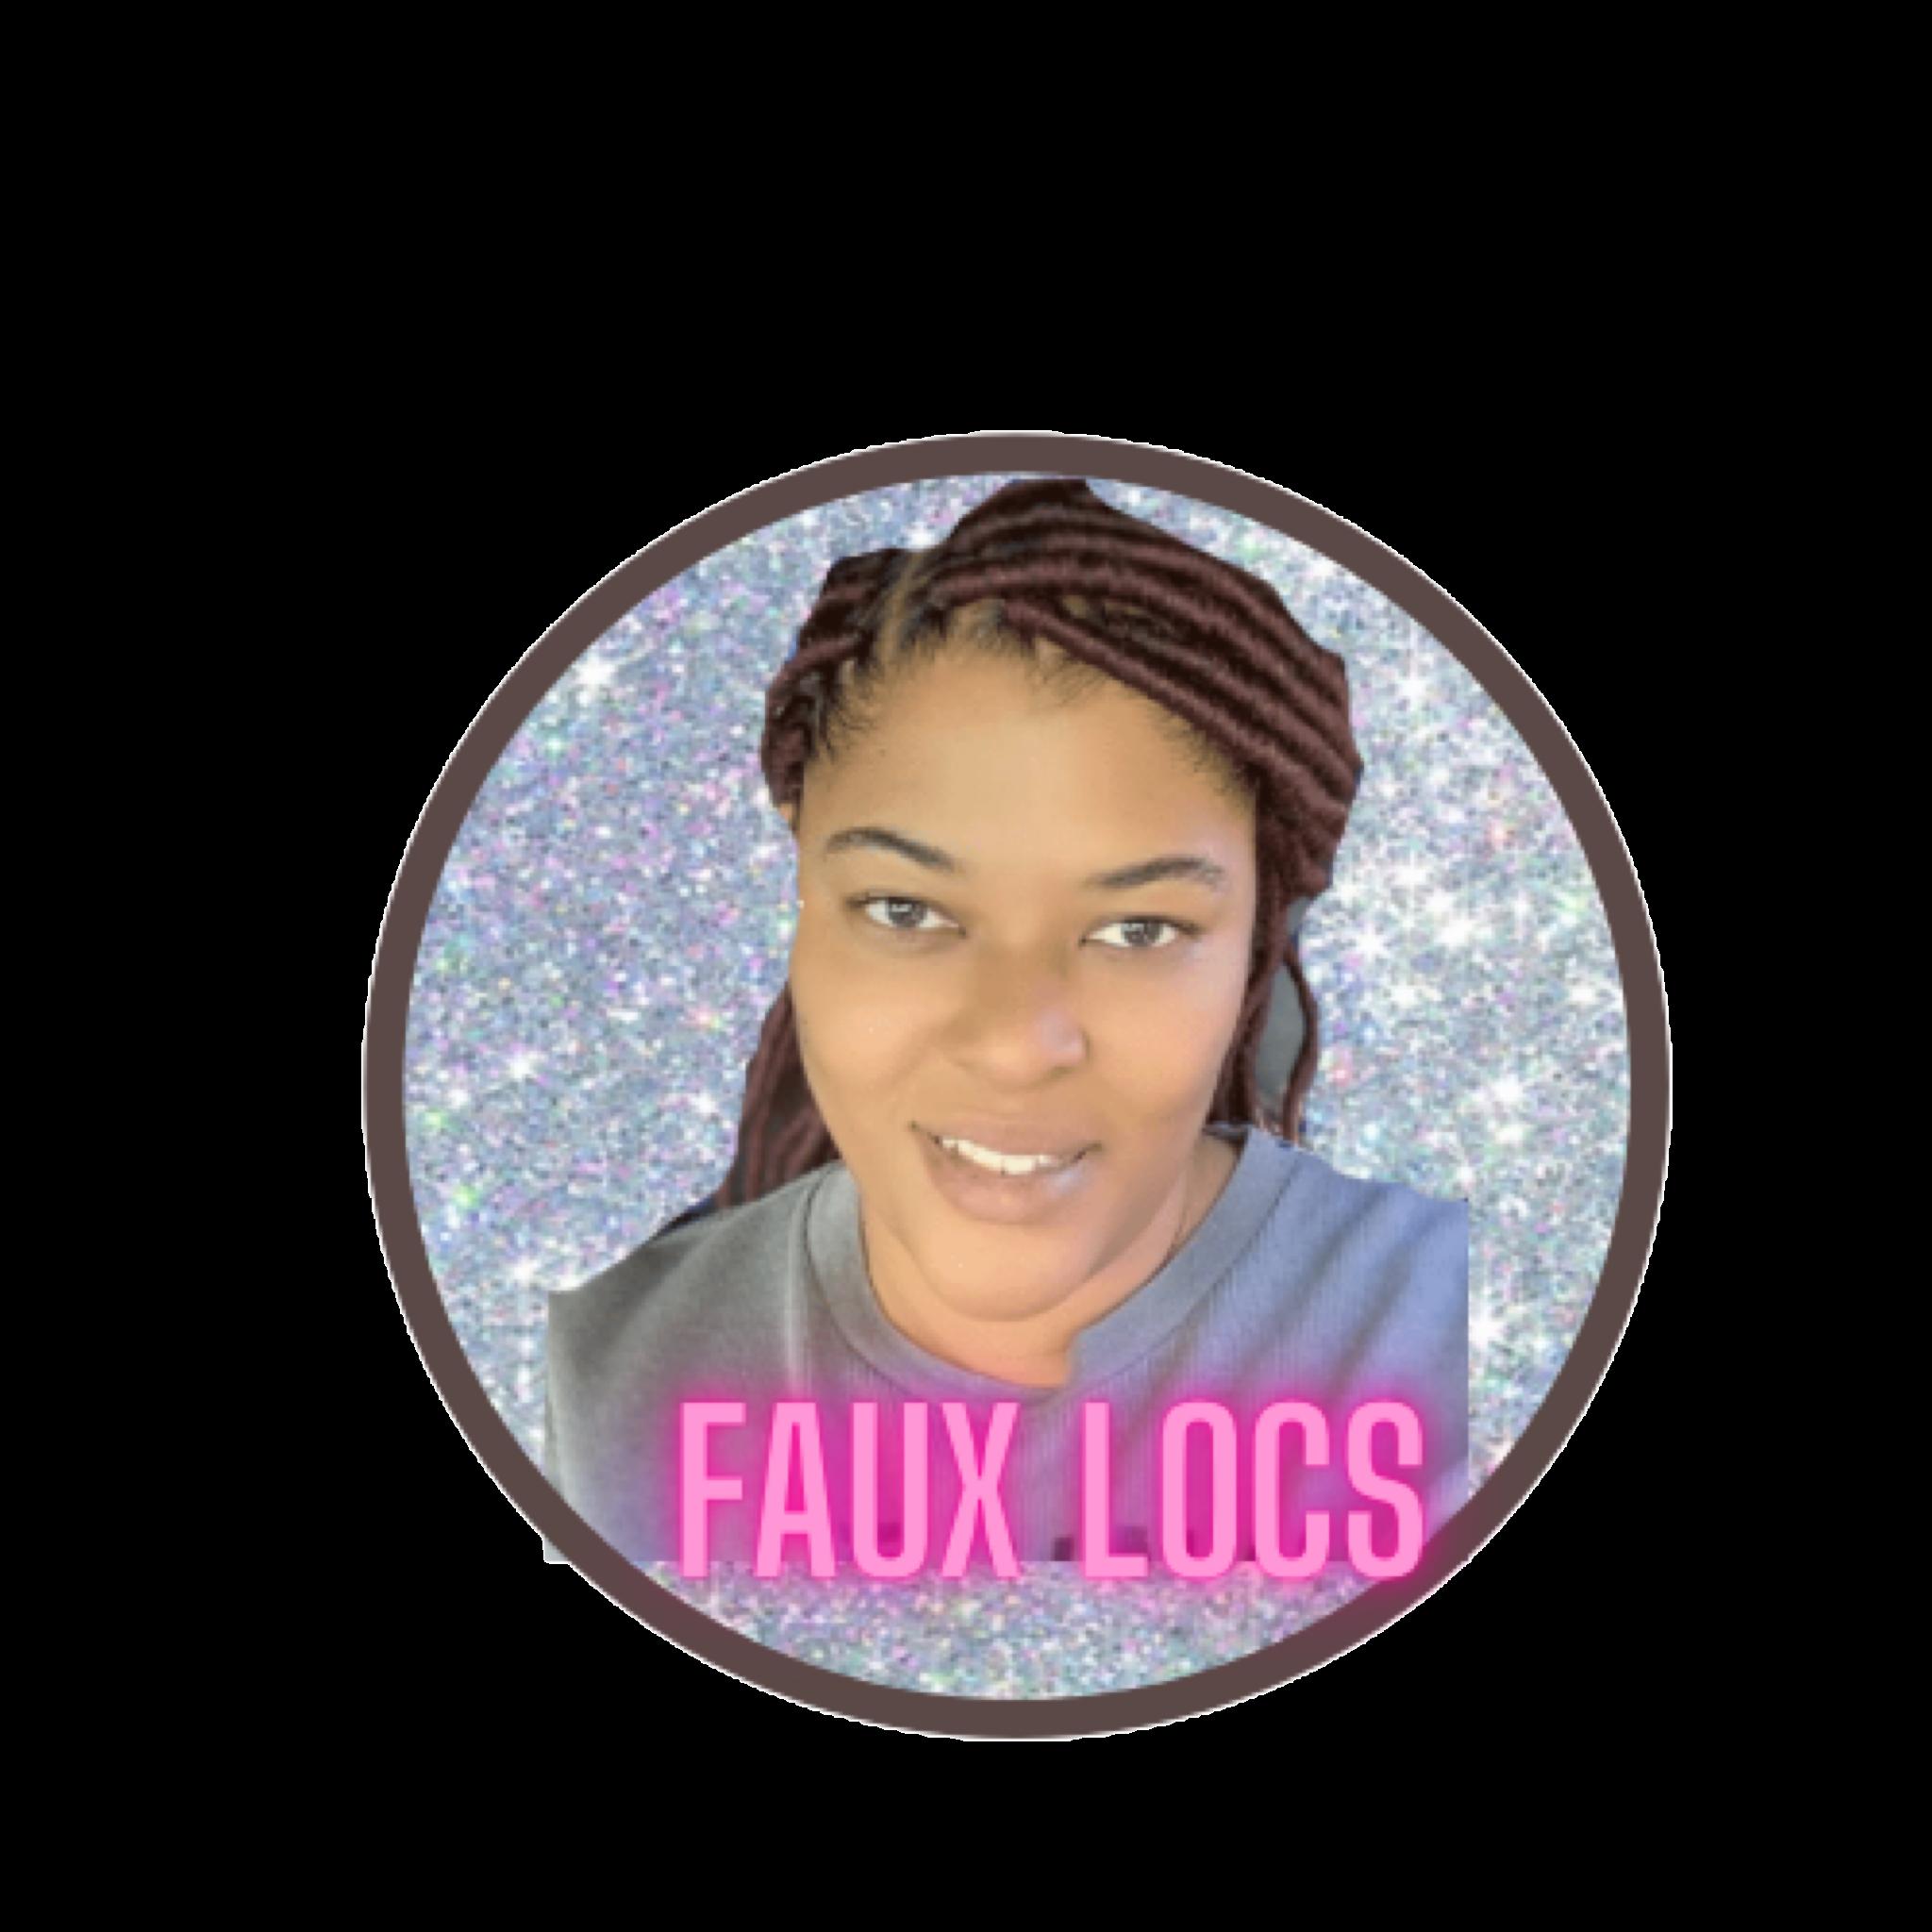 FAUX LOCS